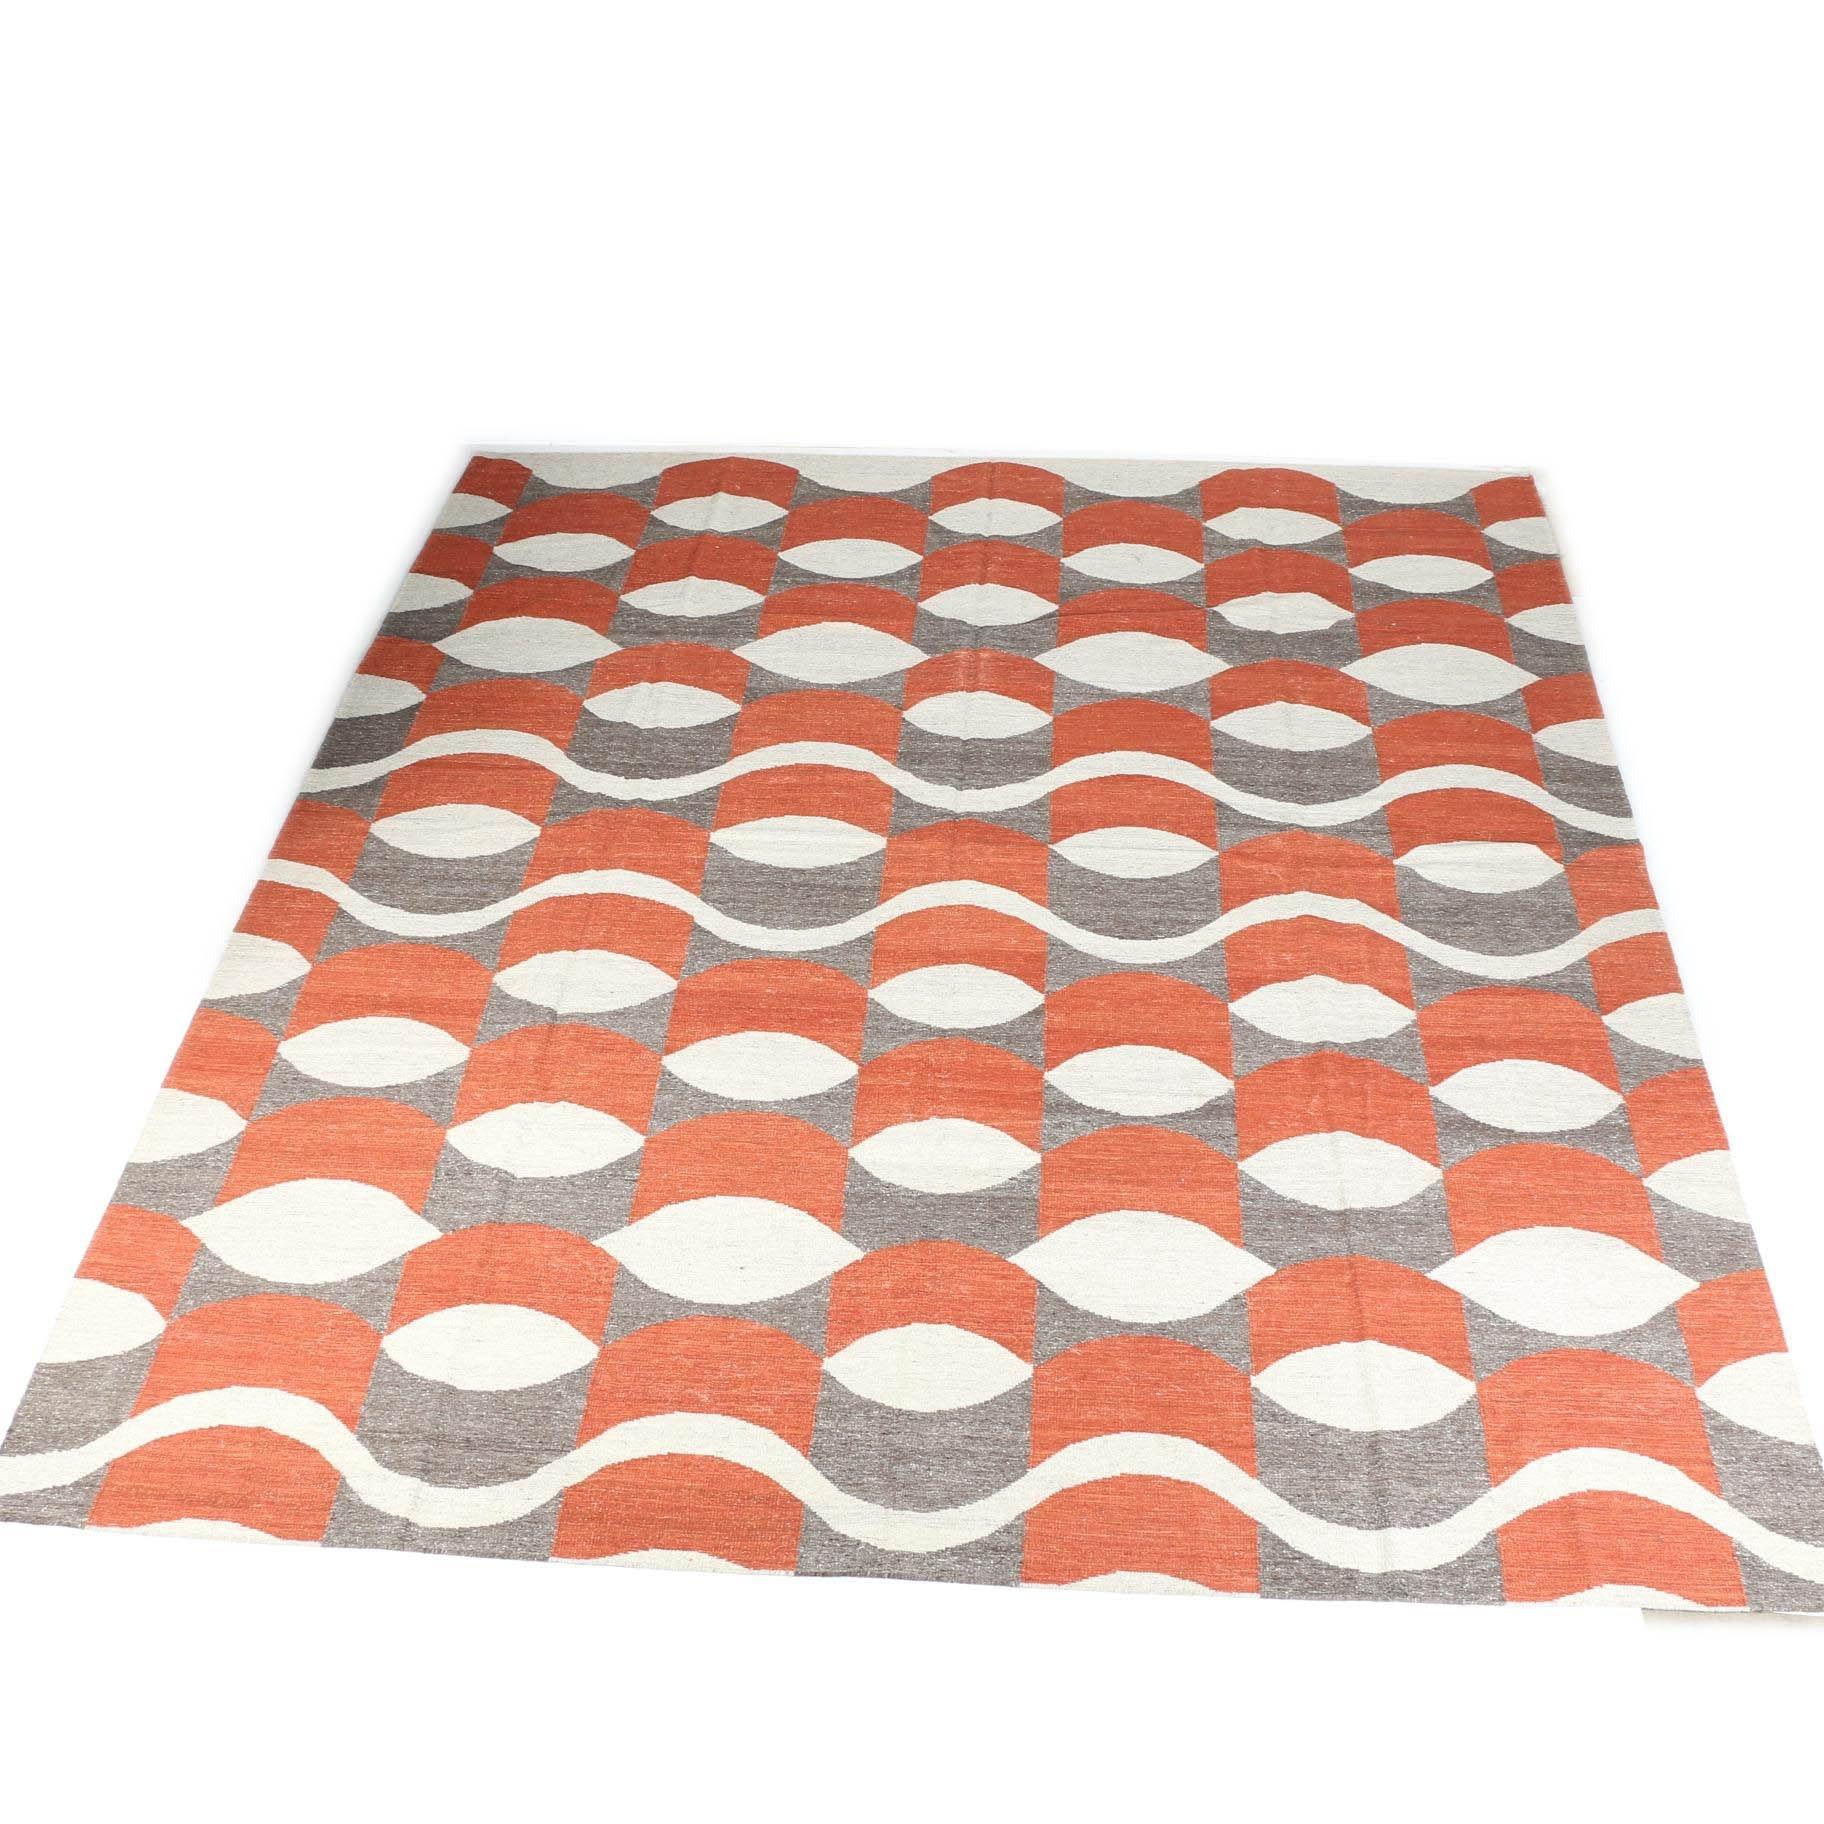 Handwoven Geometric Pattern Kilim Area Rug